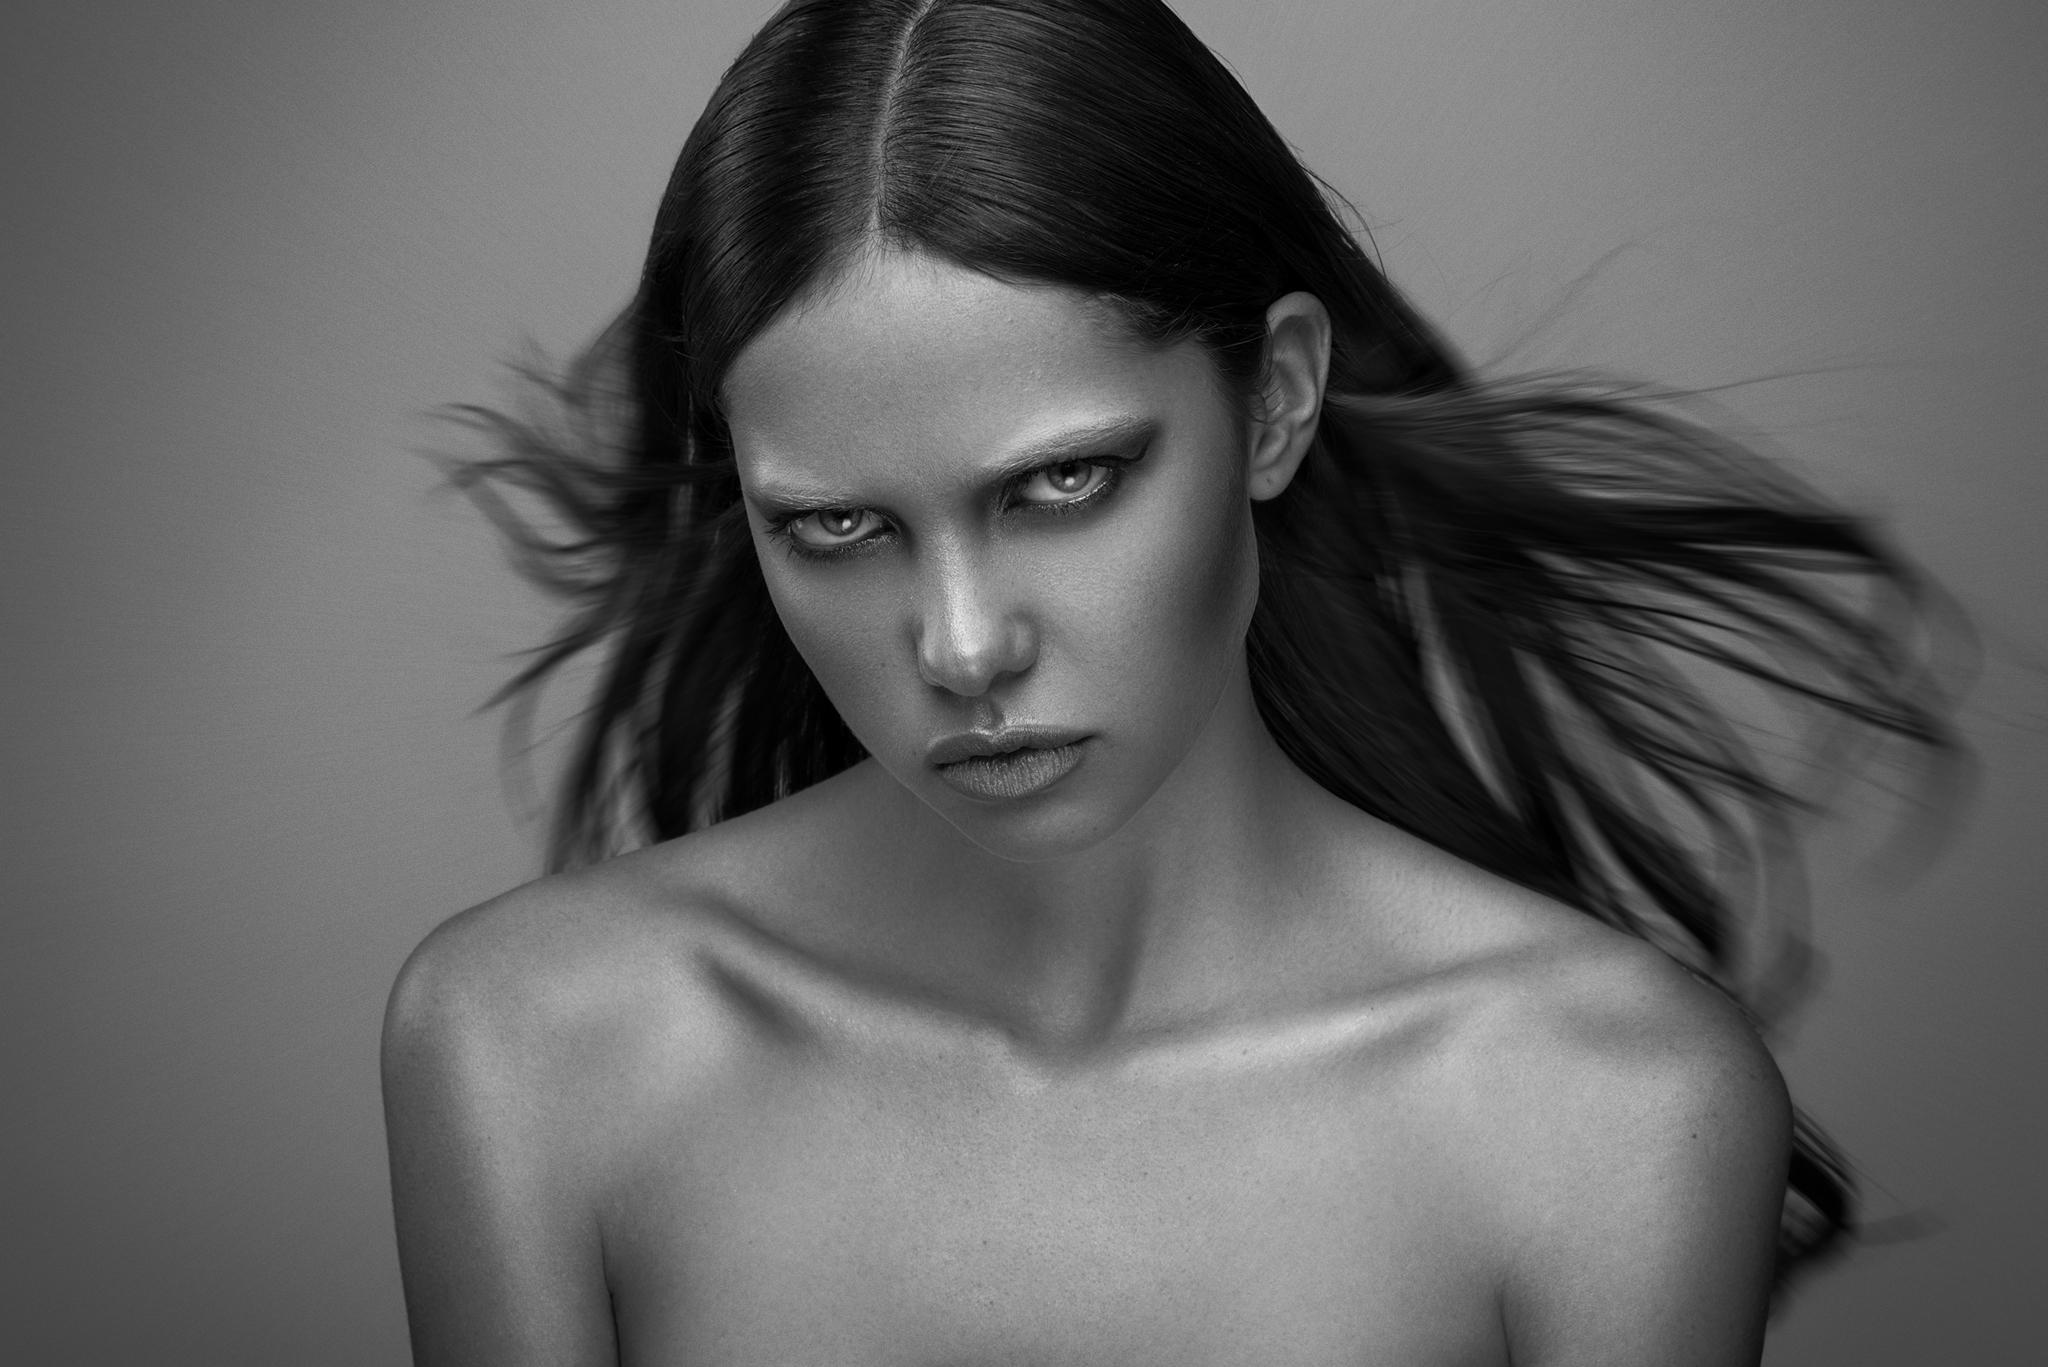 Video: 500px Interviews Portrait Photographer Michael Woloszynowicz